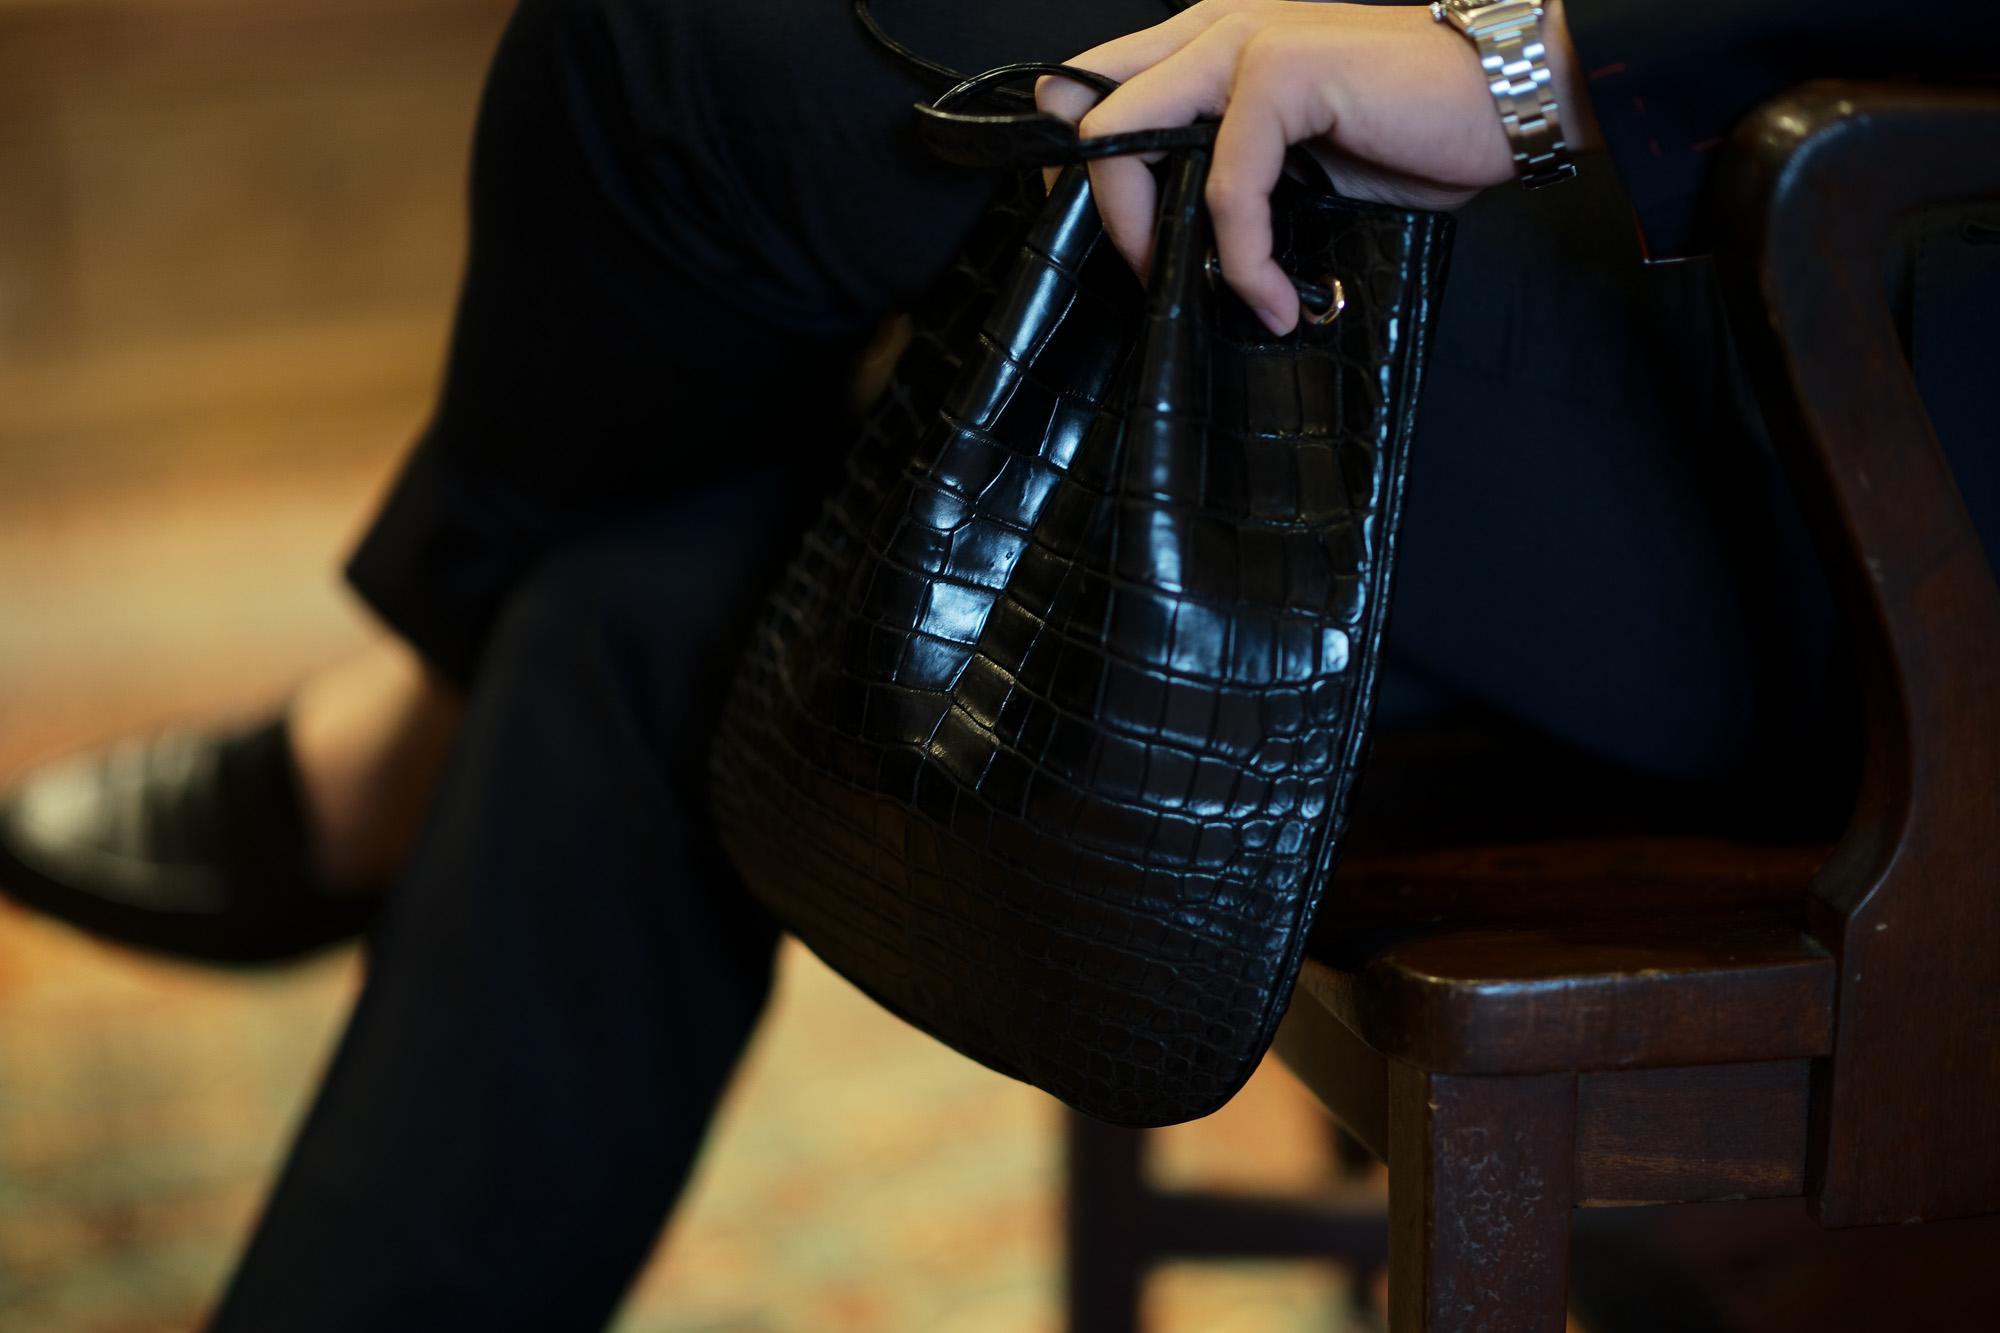 Cisei × 山本製鞄 (シセイ × 山本製鞄) Crocodile Bag(クロコダイルバック) Nile Crocodile Leather (ワニ革) ナイル クロコダイル レザードローストリングバック 巾着  BLACK(ブラック)  Made in Japan (日本製) 2019 春夏新作 【超絶 限定モデル】 愛知 名古屋 altoediritto アルトエデリット